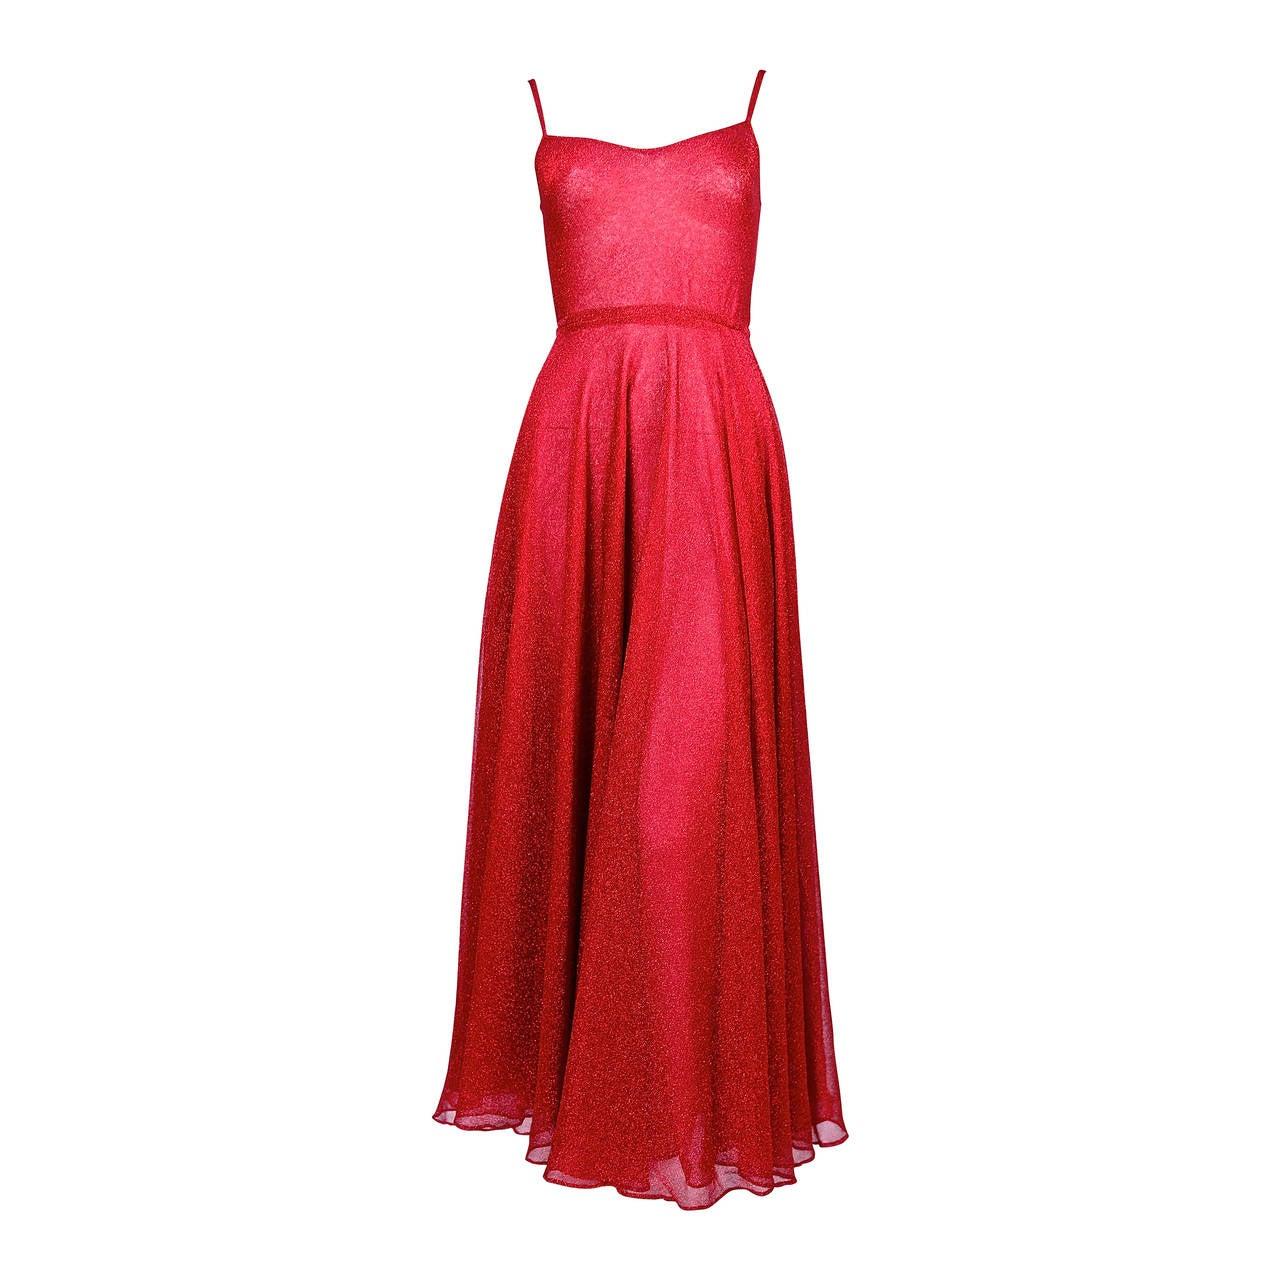 1970's HALSTON fuchsia lurex dress